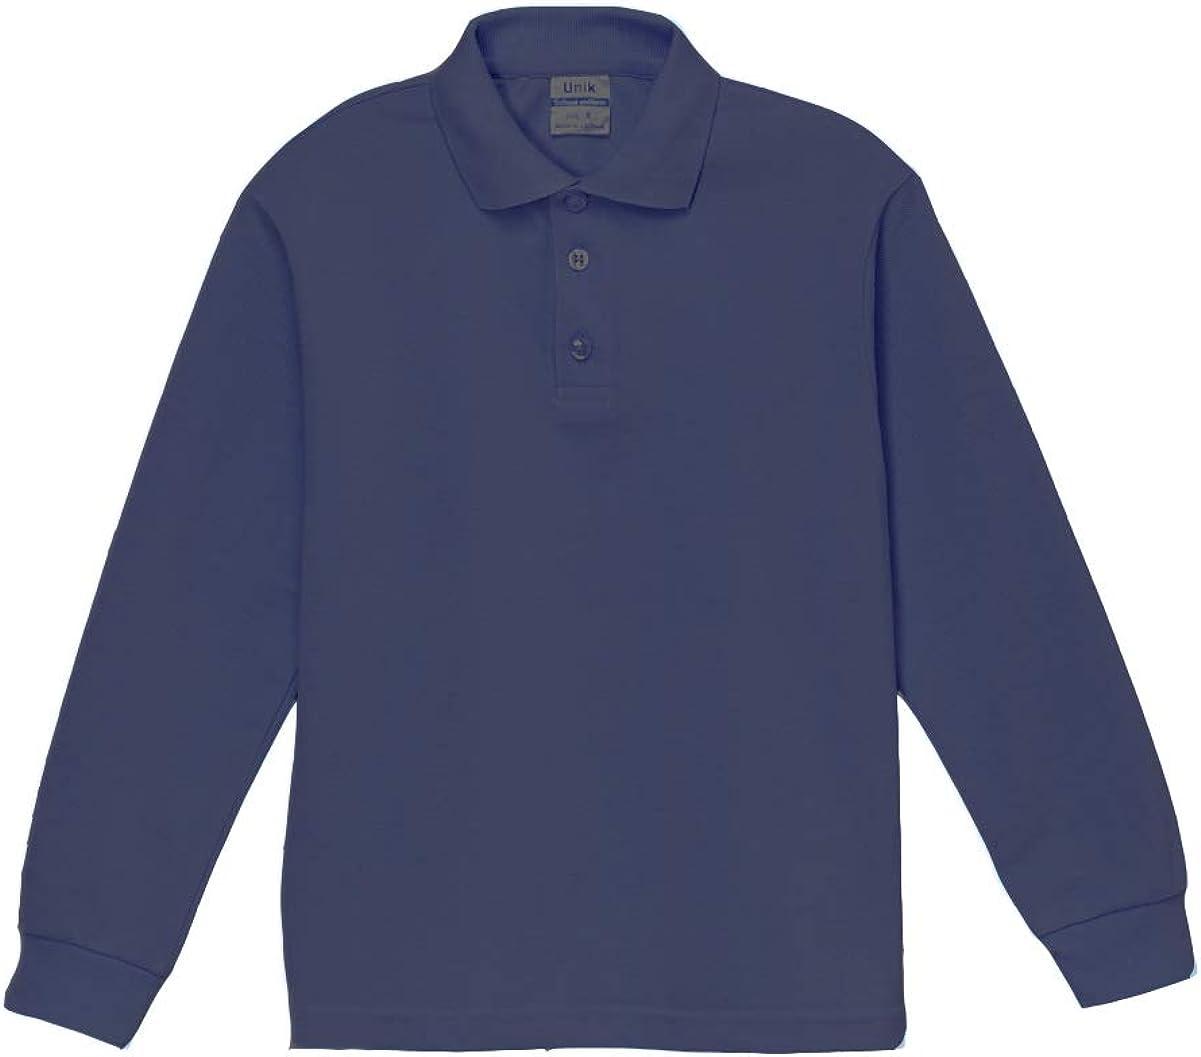 unik Boy's Uniform Pique Polo Shirt Long Sleeve, Navy White Sky Blue